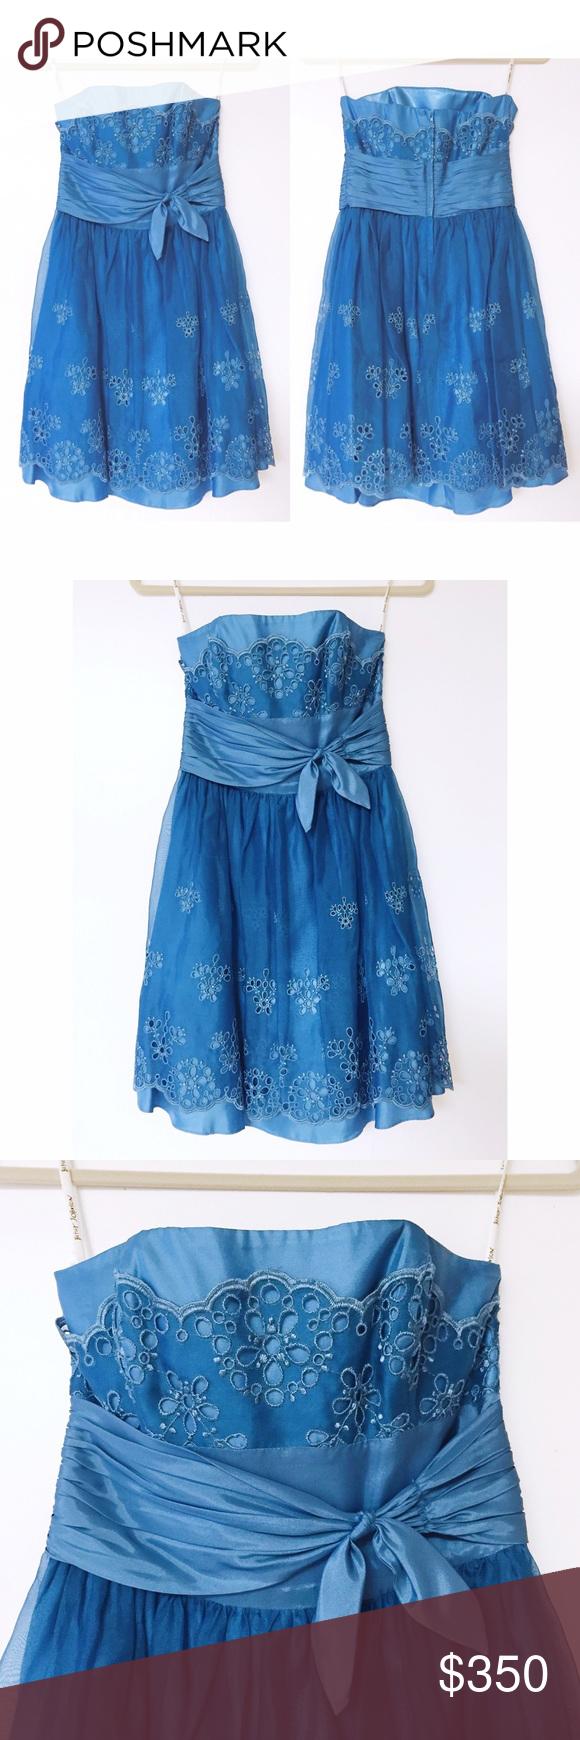 Fancy Betsey Johnson Party Dresses Photo - All Wedding Dresses ...